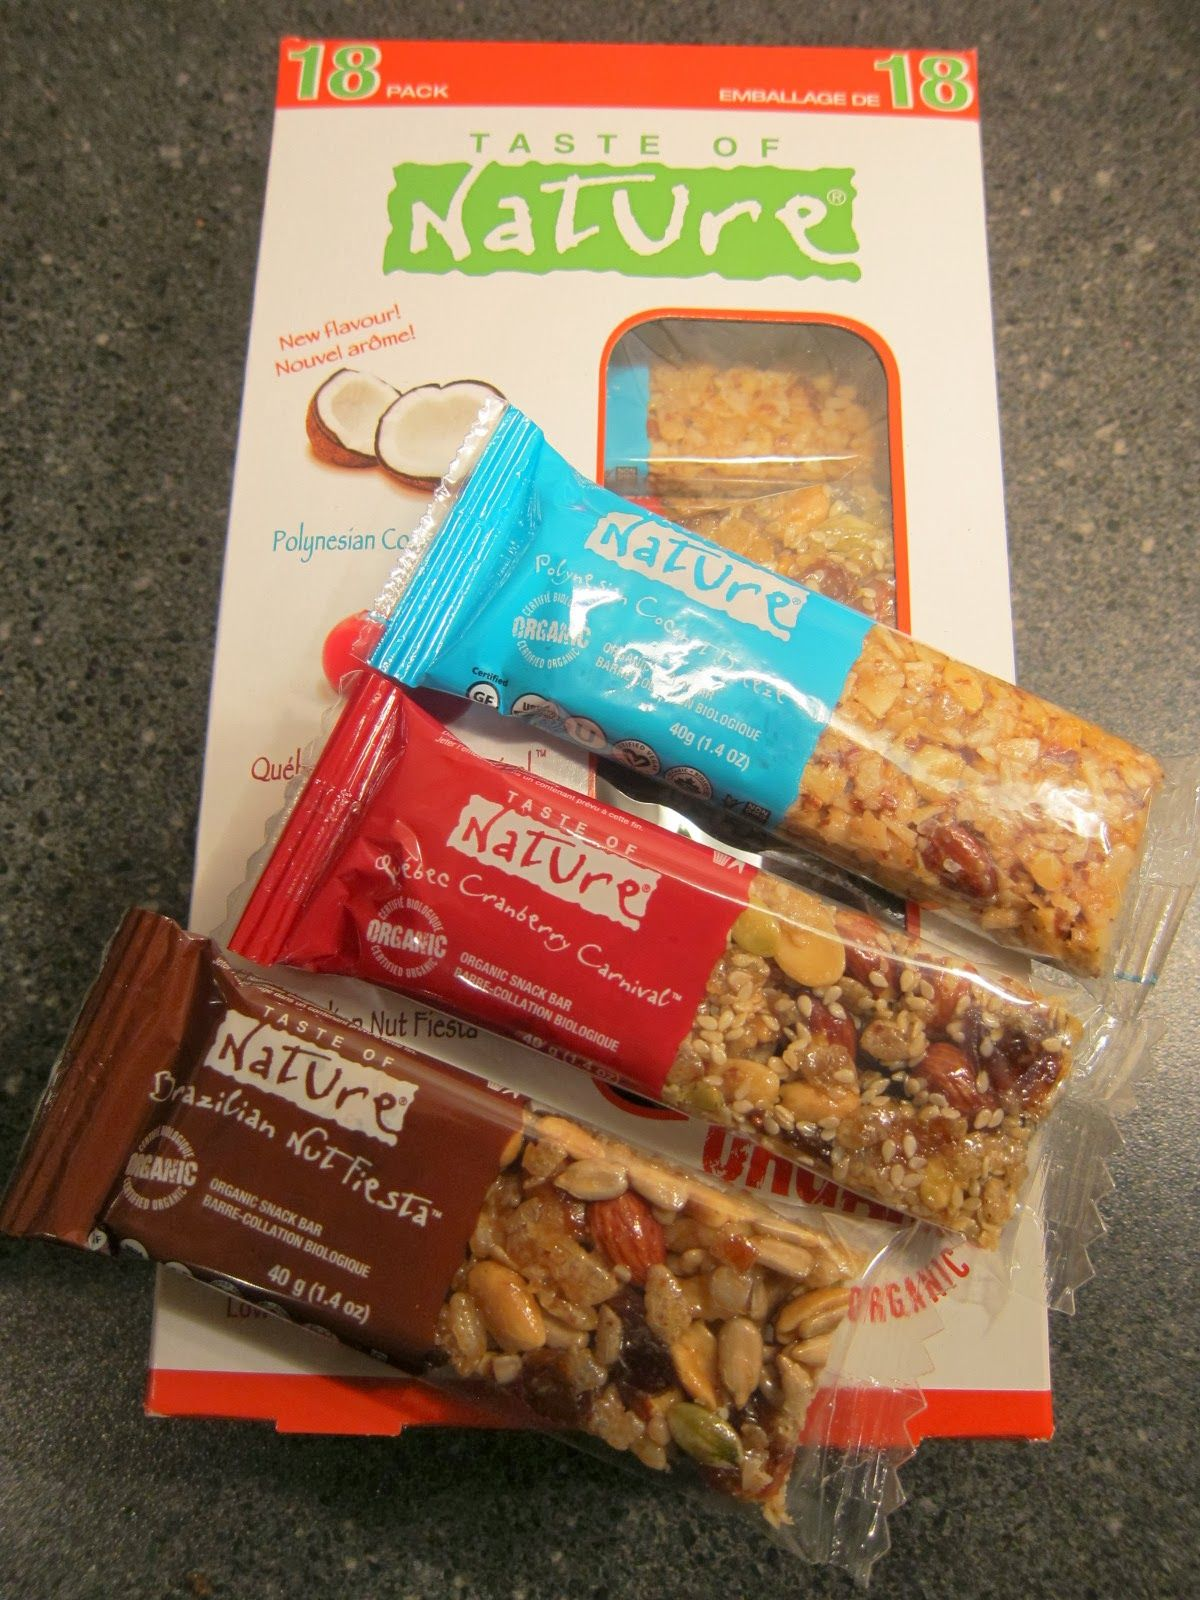 Taste of Nature nut bars (gf and vegan) I get at Costco